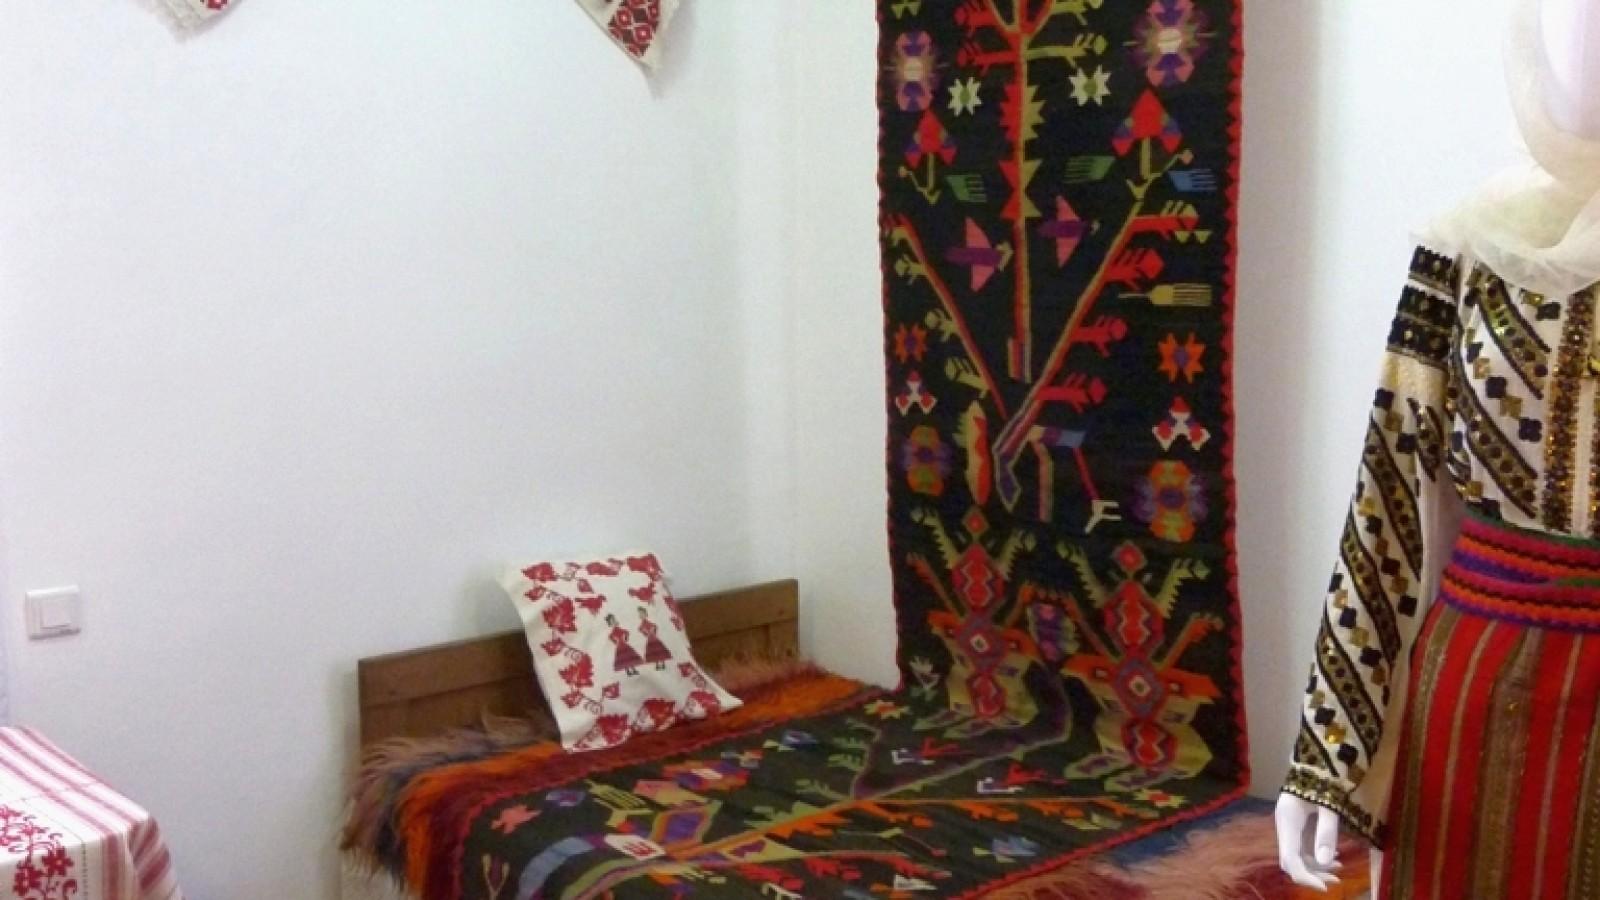 Muzeul de Etnografie Vergu Manaila